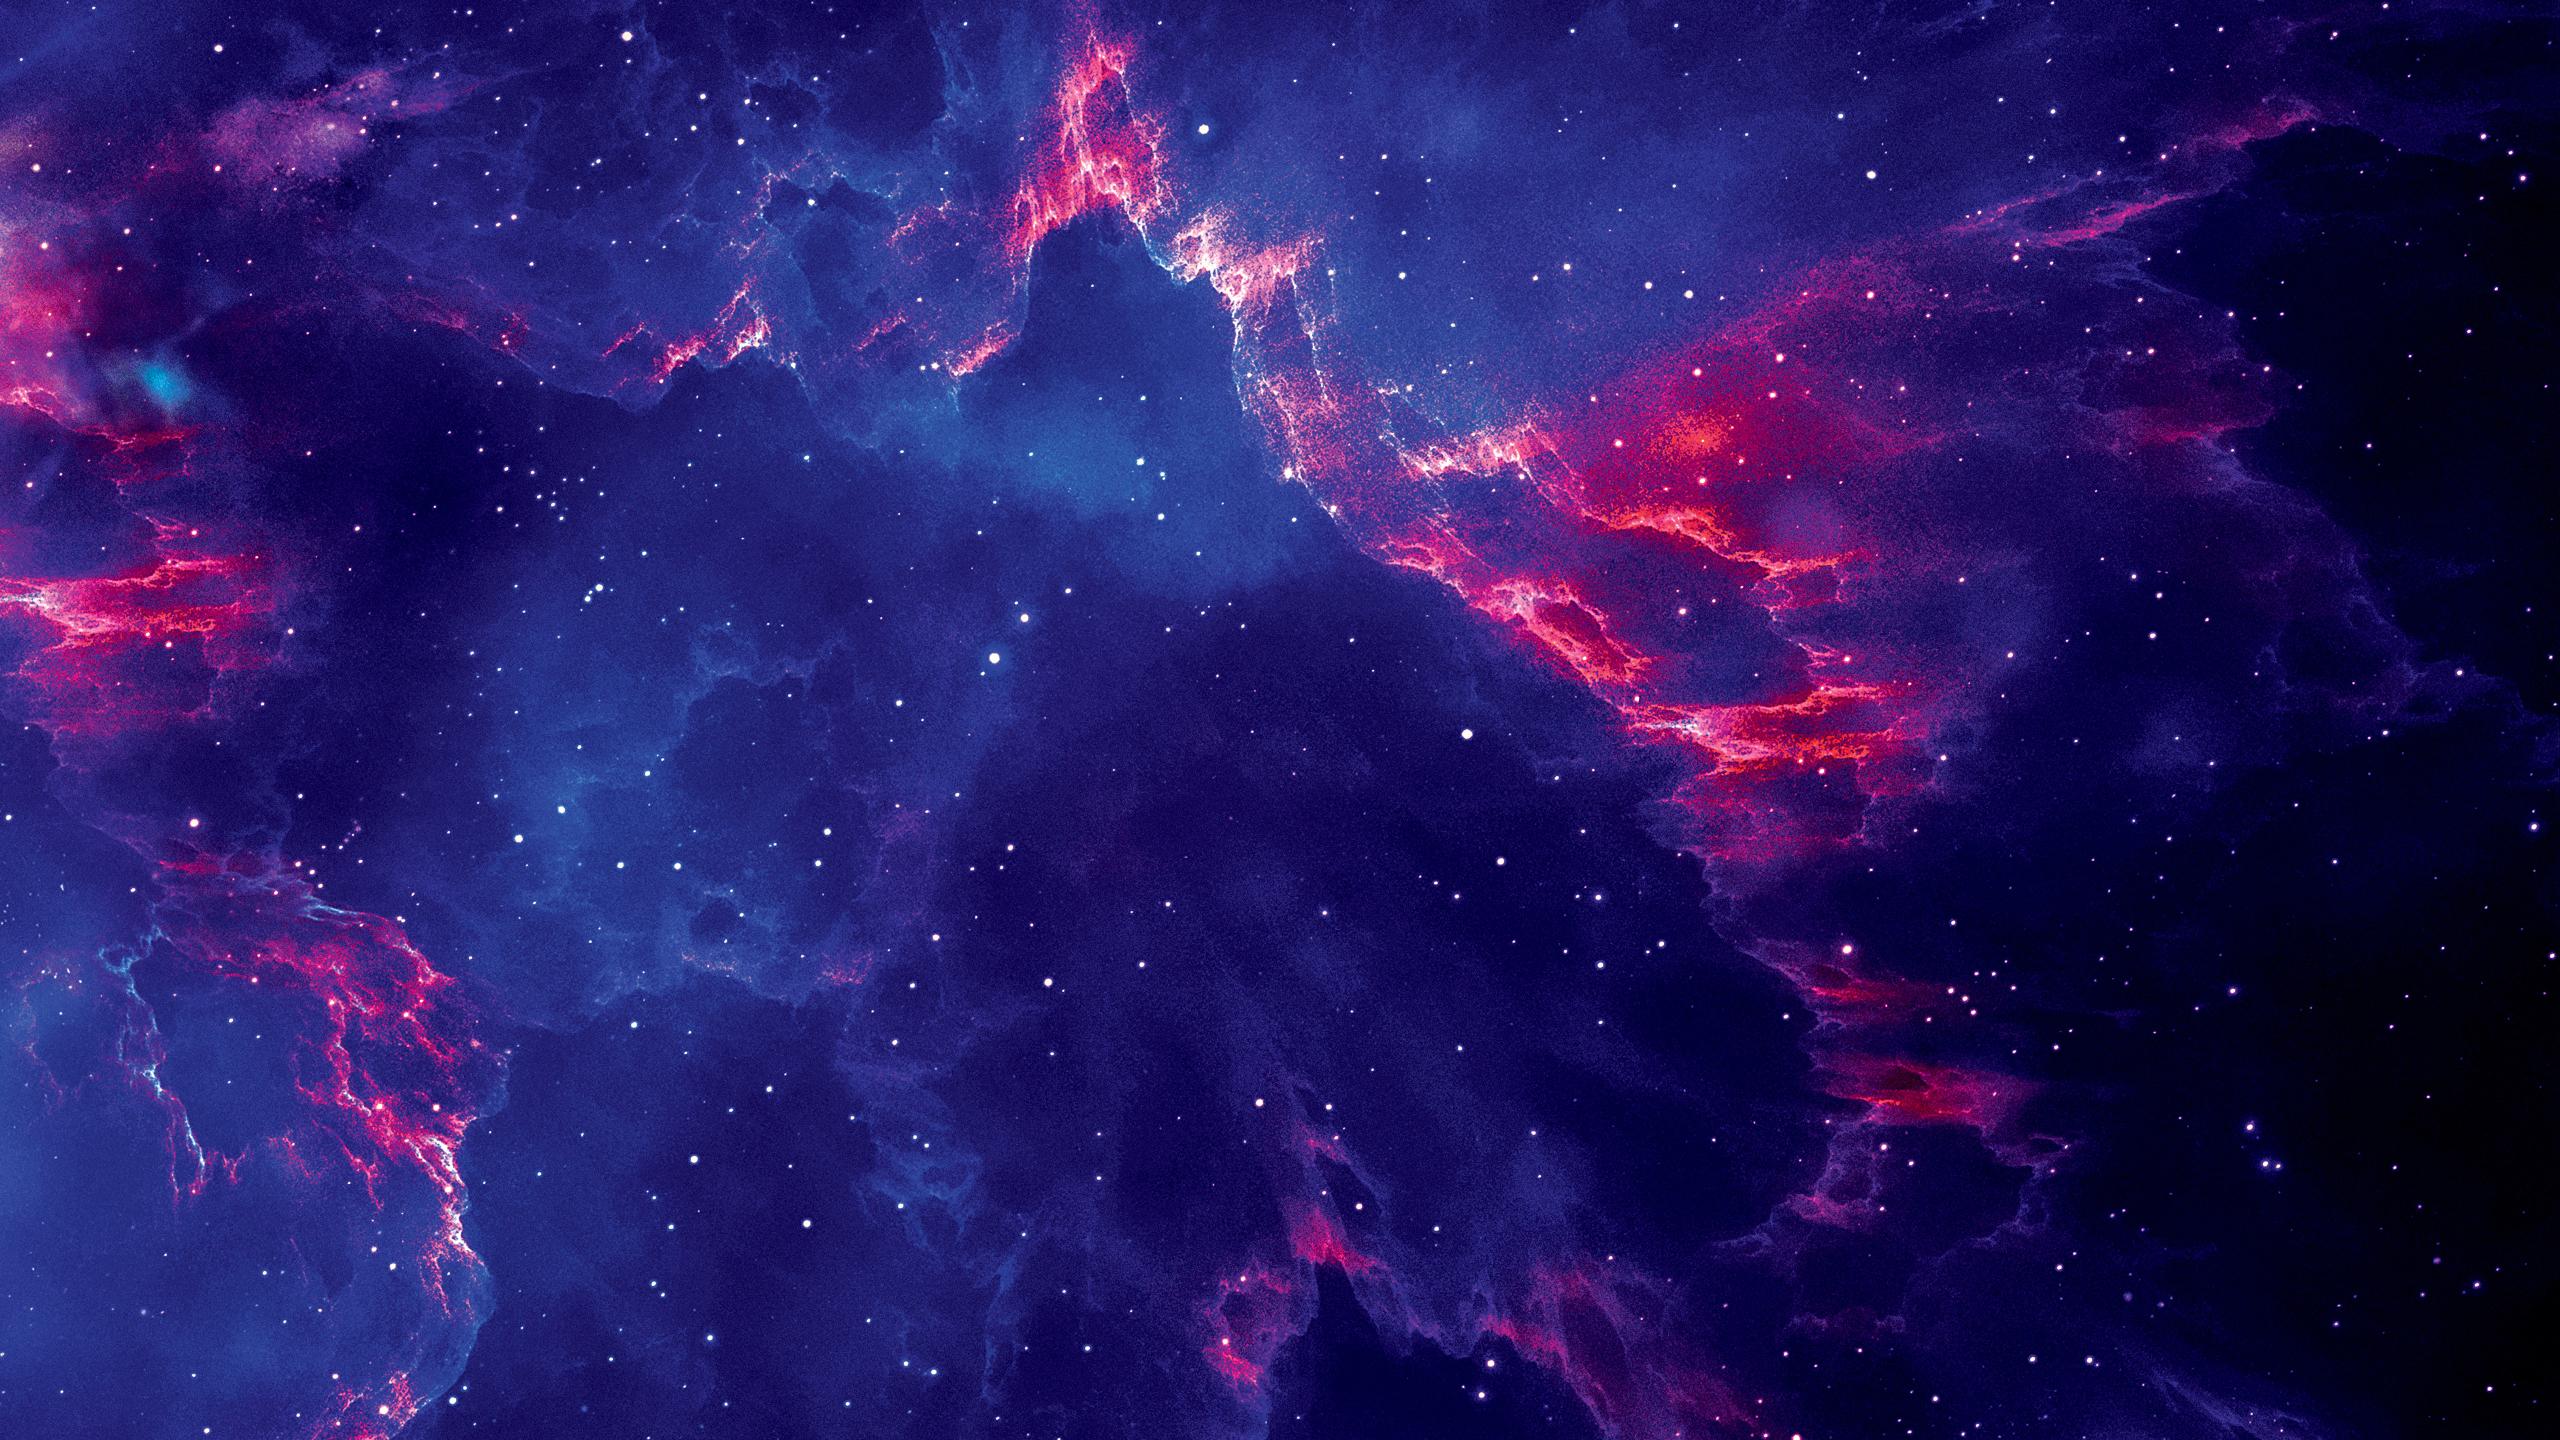 2560x1440 Starry Galaxy 1440p Resolution Background Hd